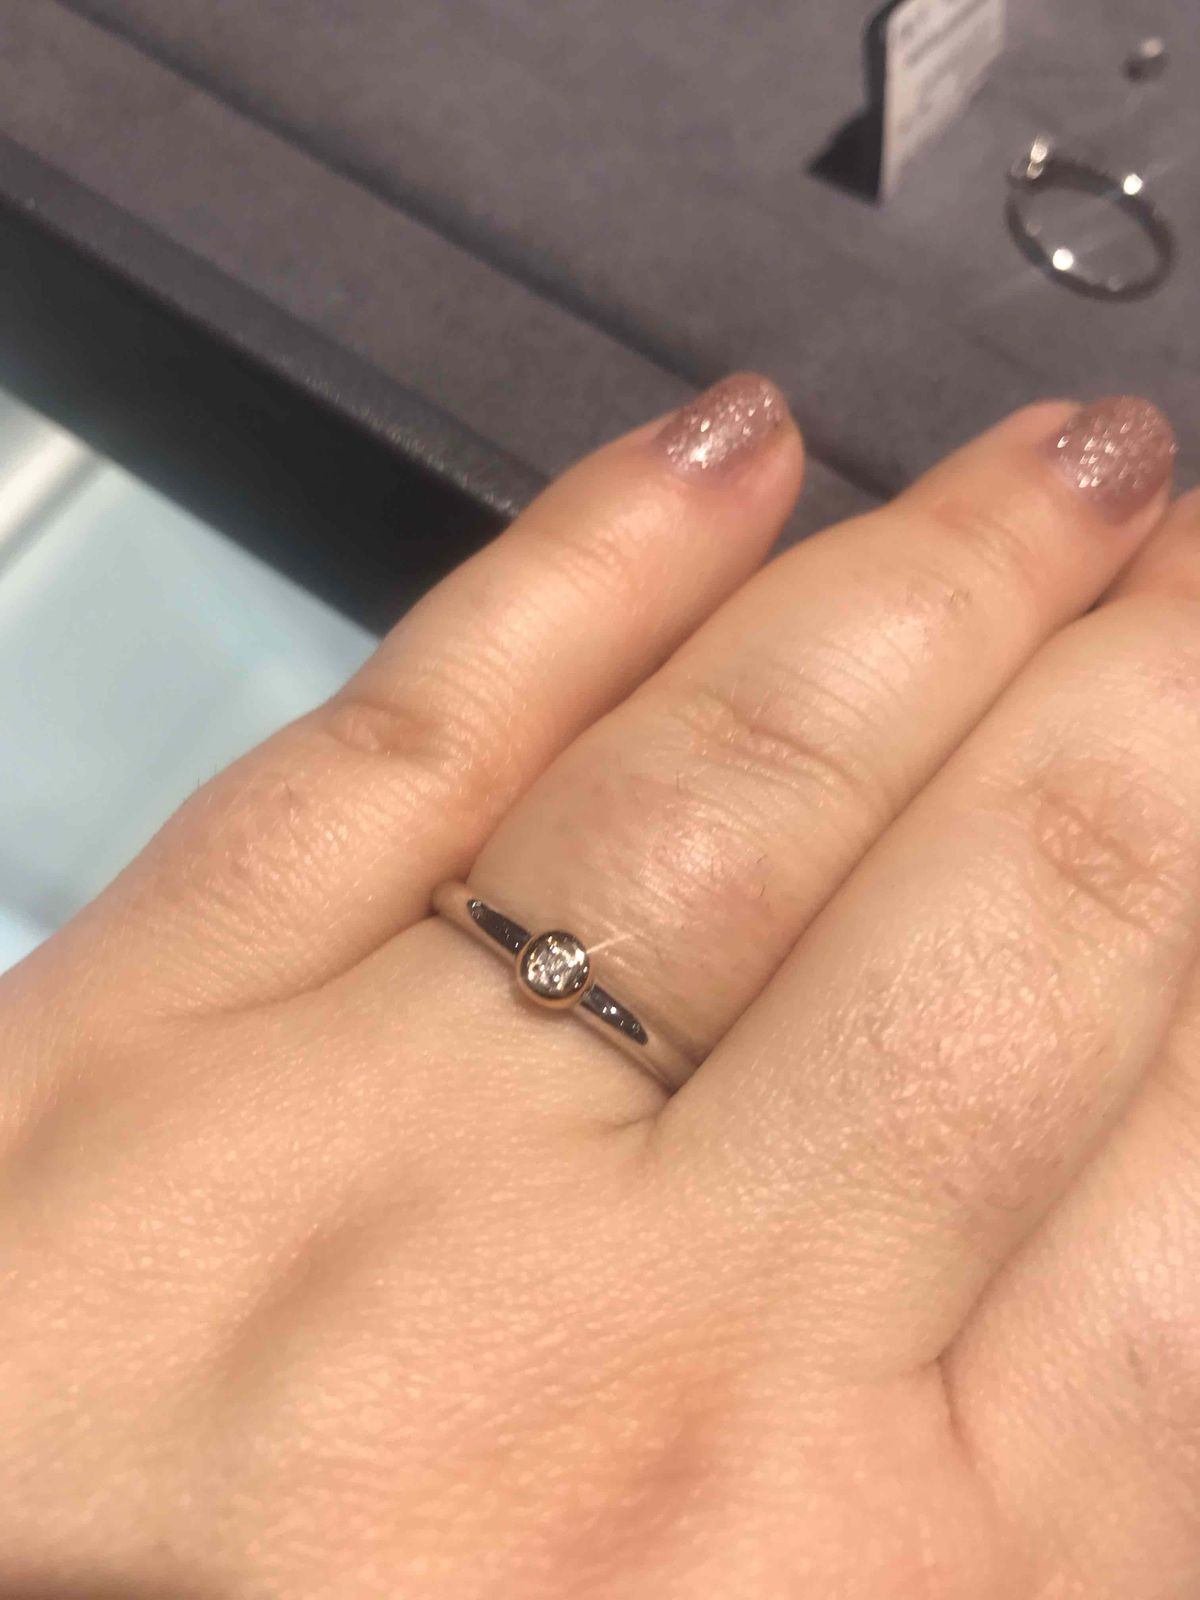 Серебряное кольцо с бриллиантиком